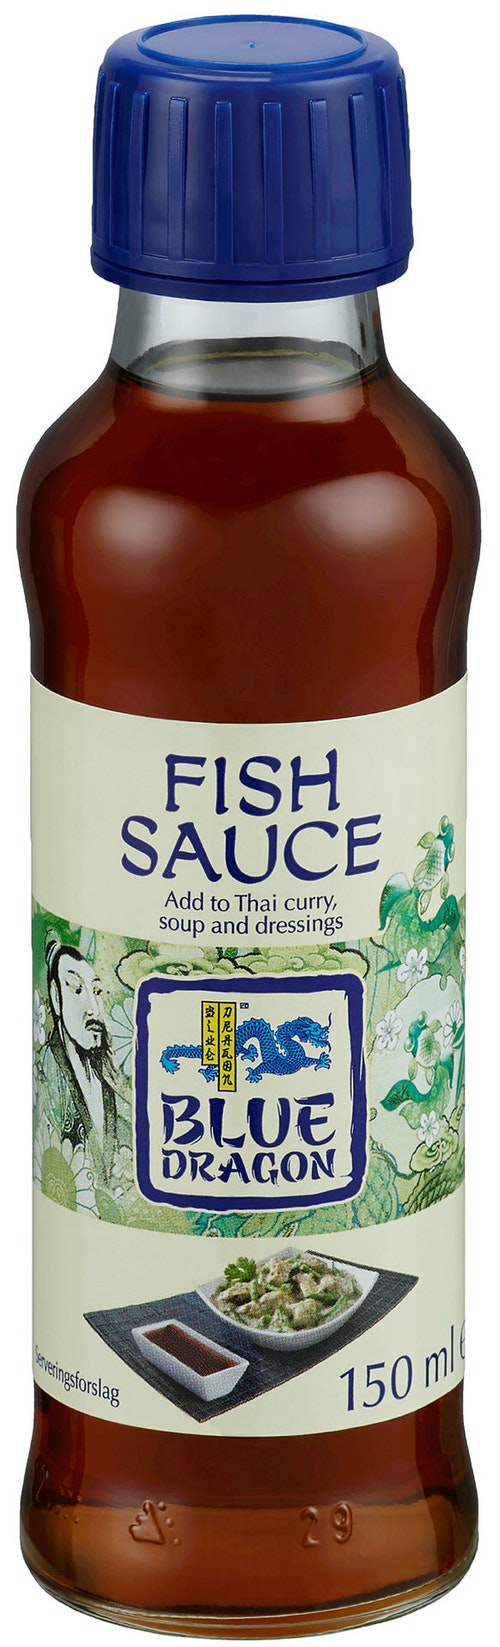 Blue Dragon Fish Sauce 150 ml